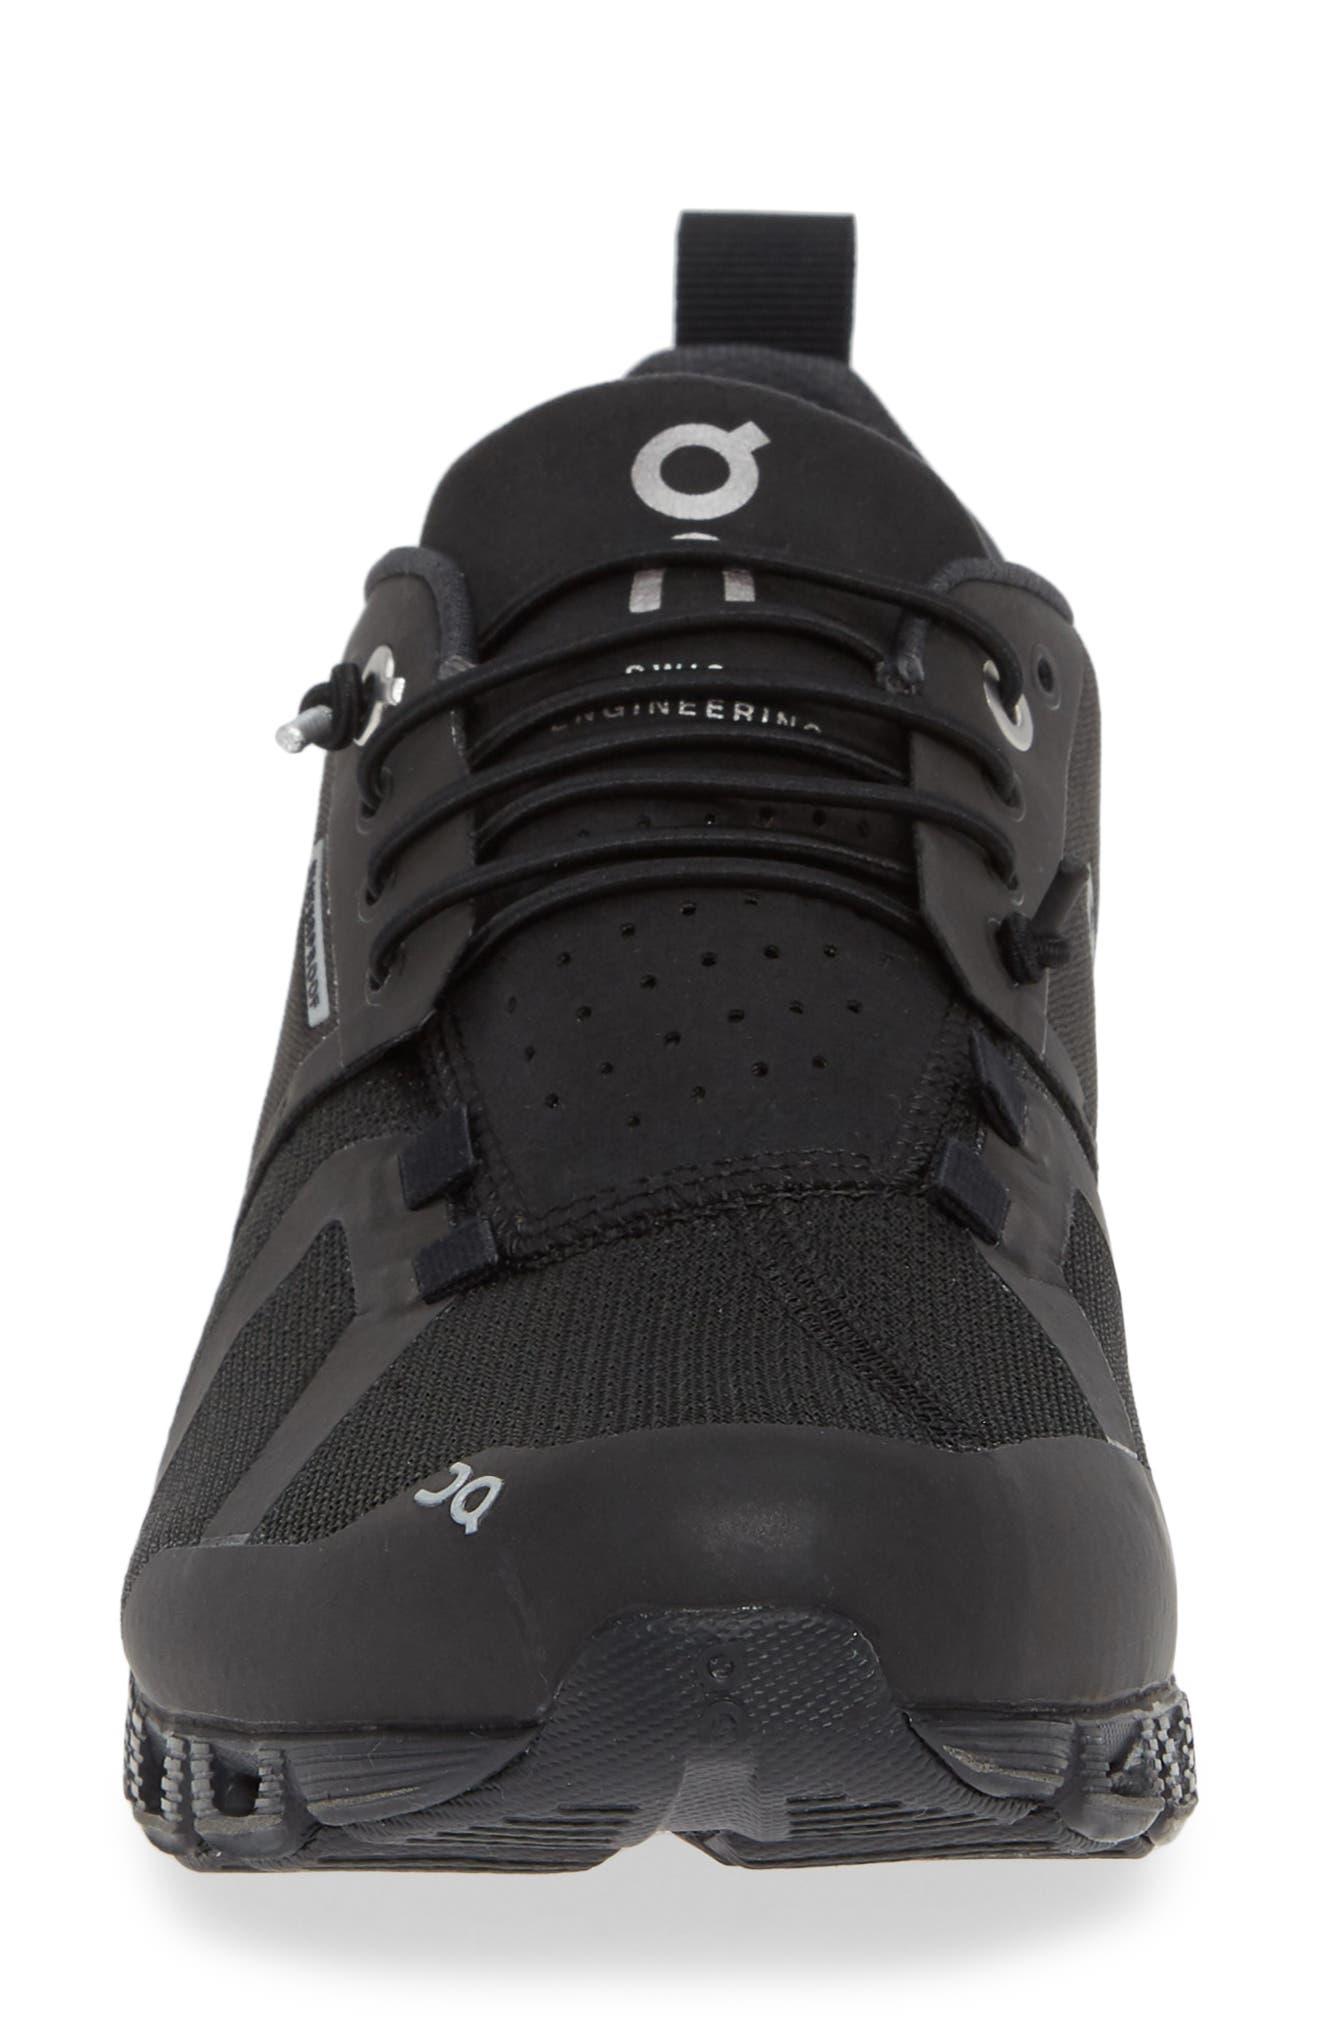 Cloud Waterproof Running Shoe,                             Alternate thumbnail 4, color,                             BLACK/ LUNAR